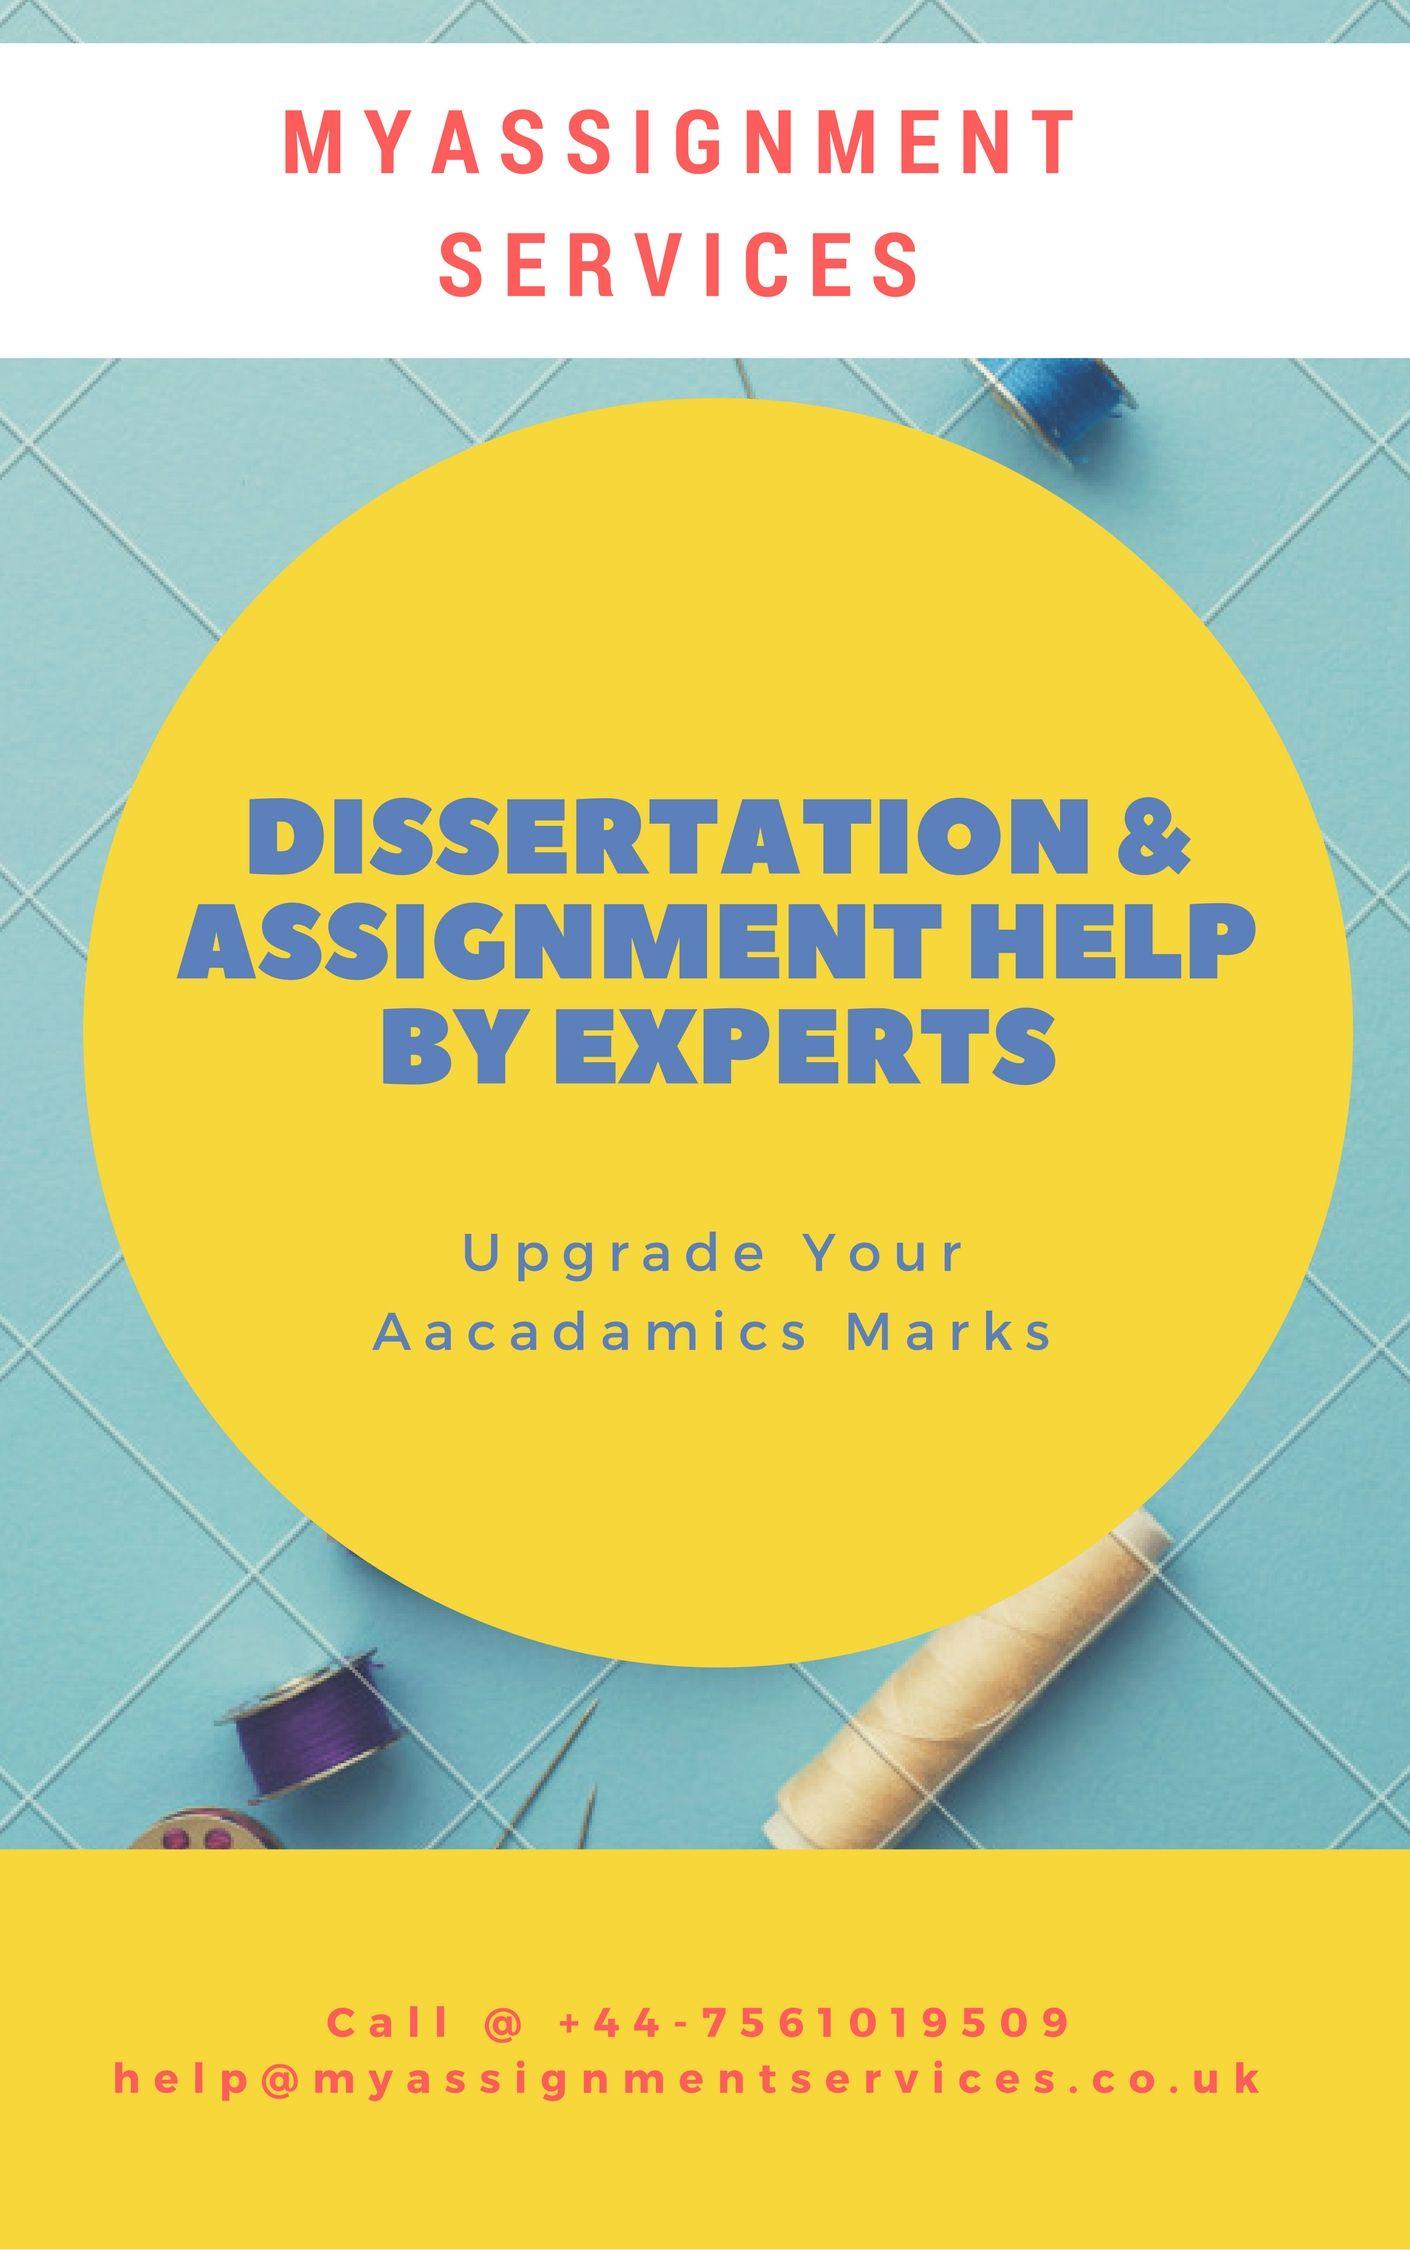 I need an dissertation writier help finishing my